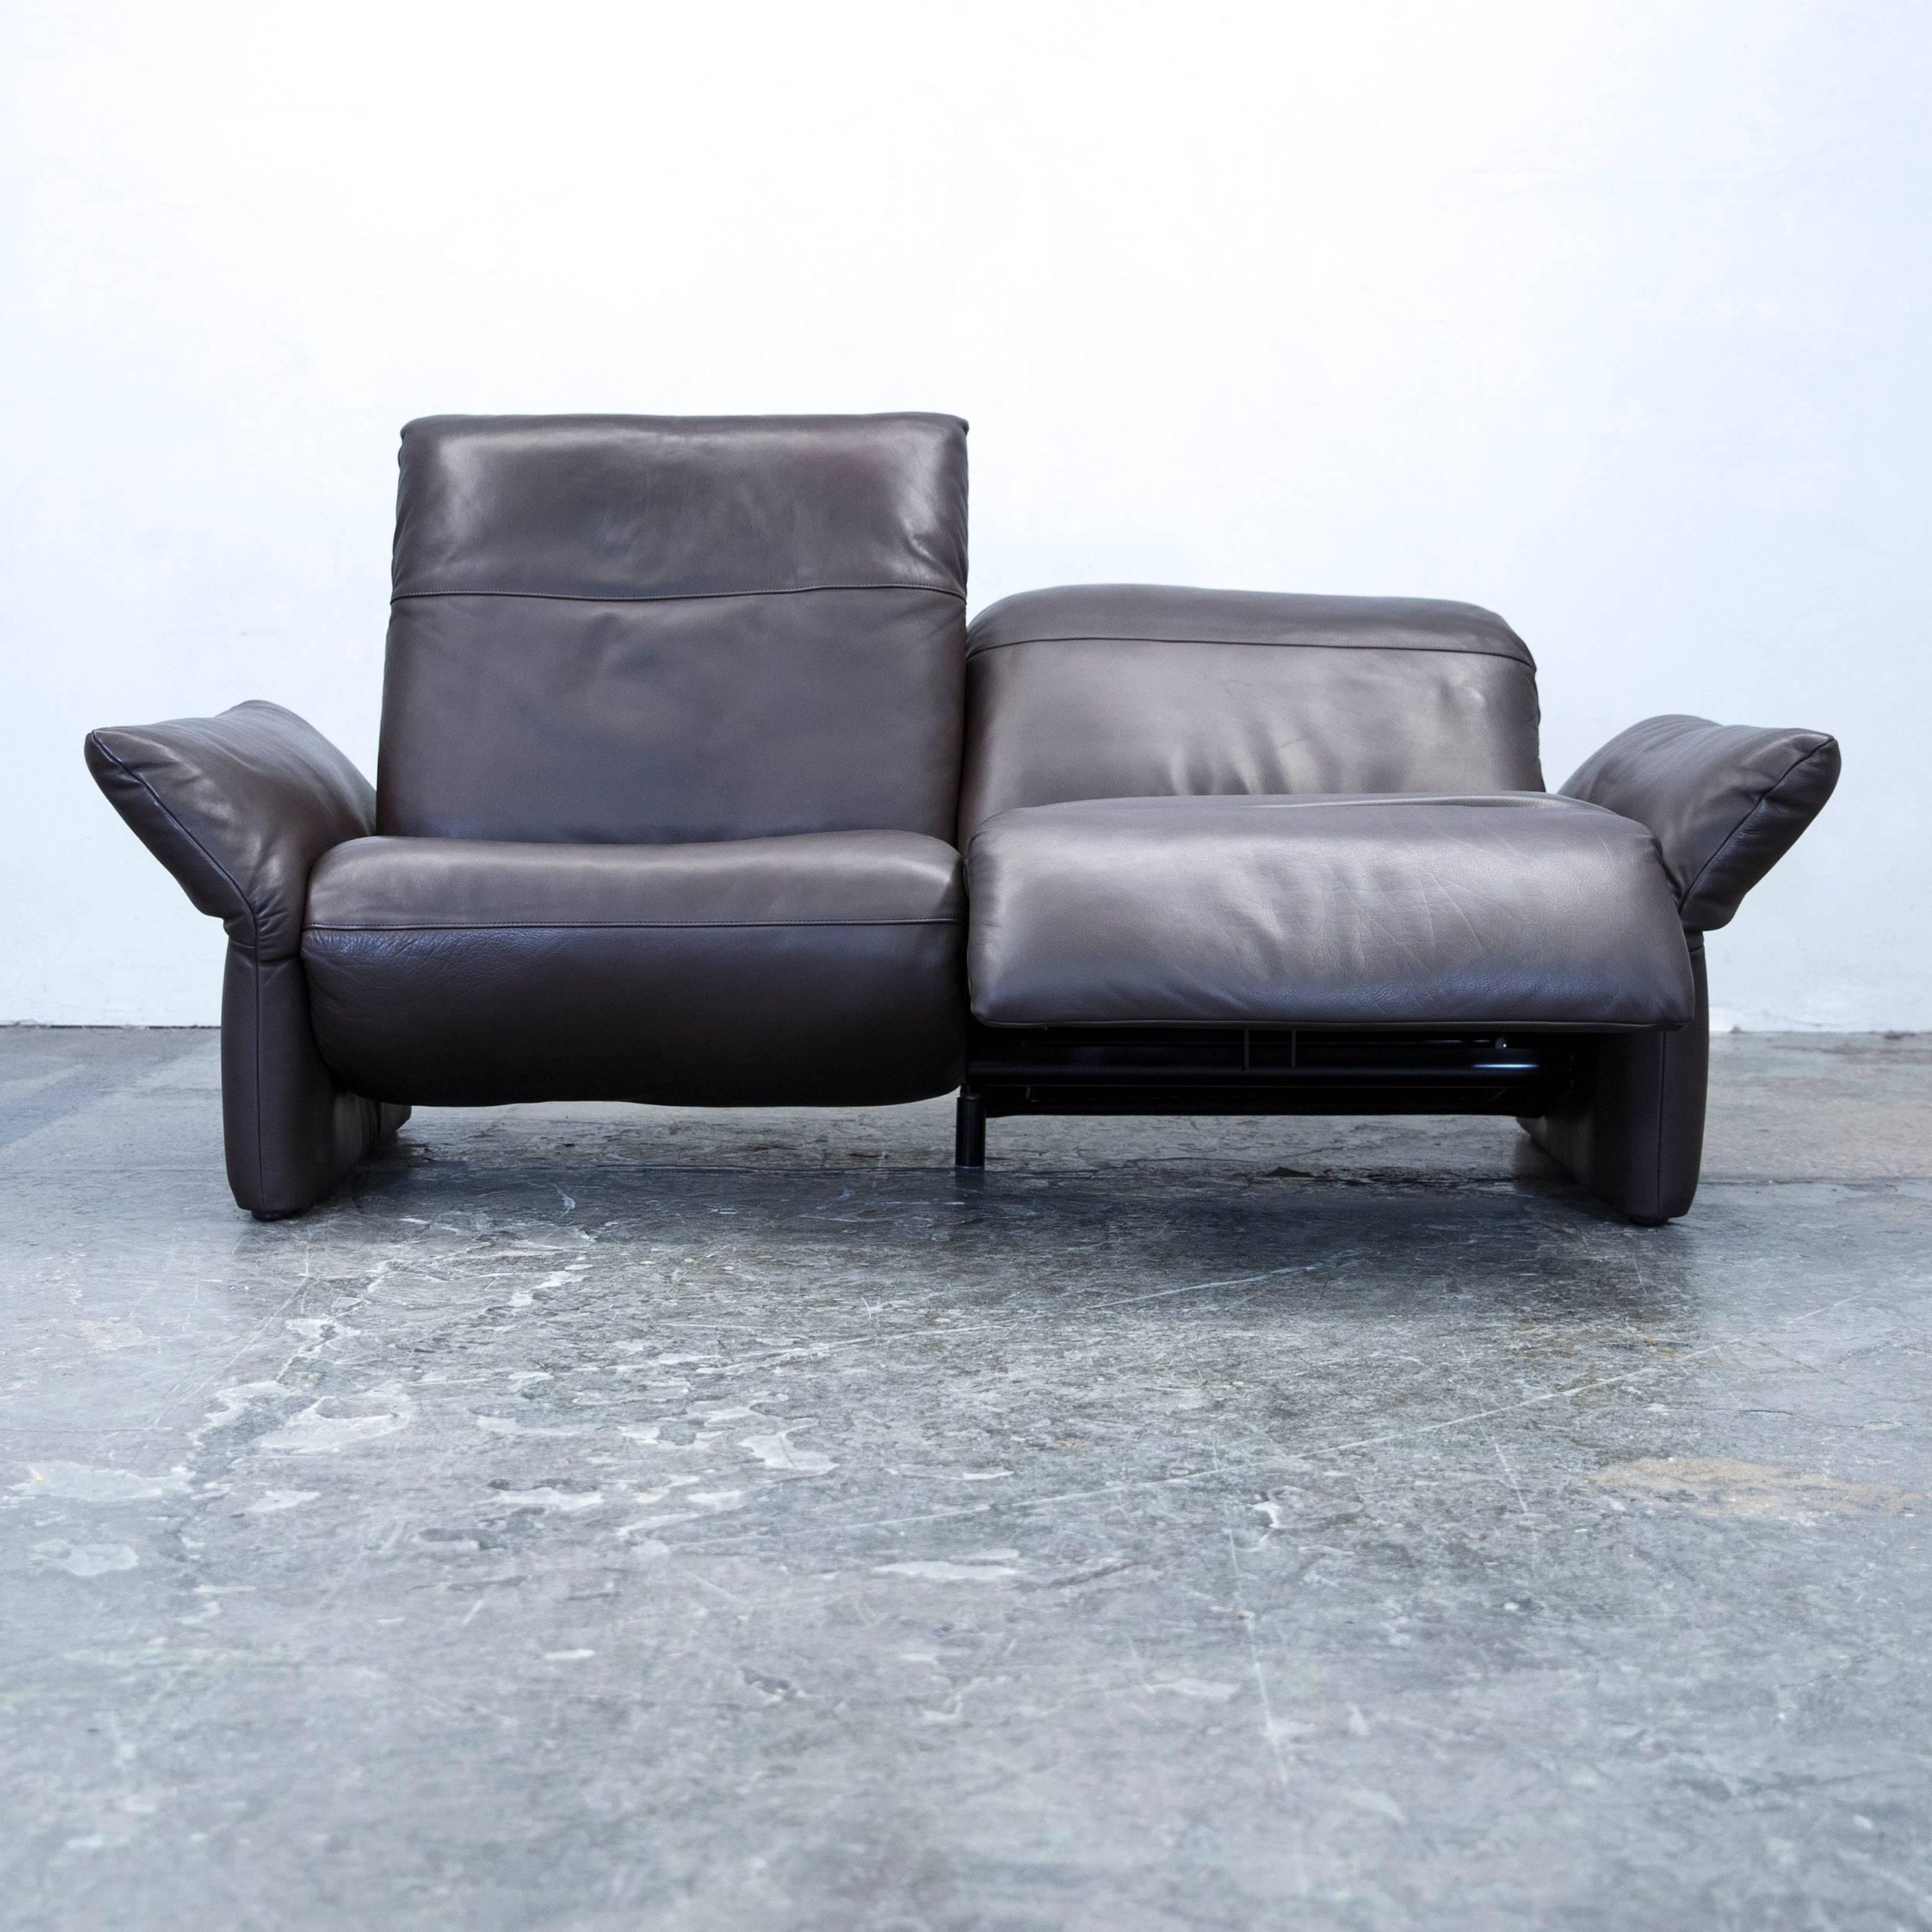 Faszinierend Couch Braun Leder Das Beste Von Sofa - Maak Het U Gemakkelijk Om